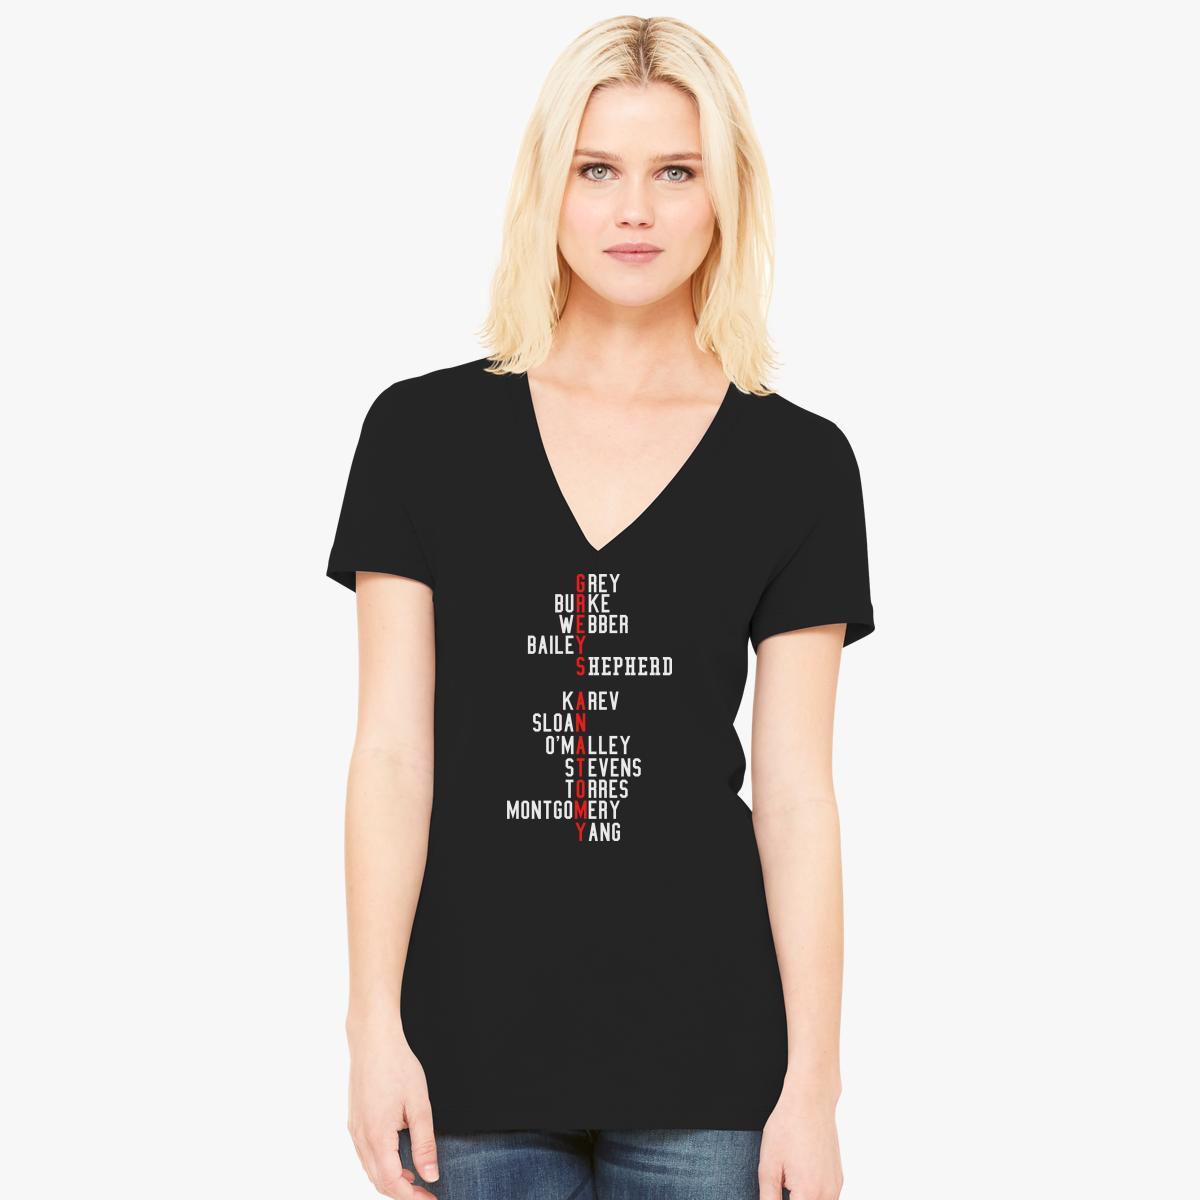 Grey\'s Anatomy Early Cast Names Women\'s V-Neck T-shirt   Customon.com